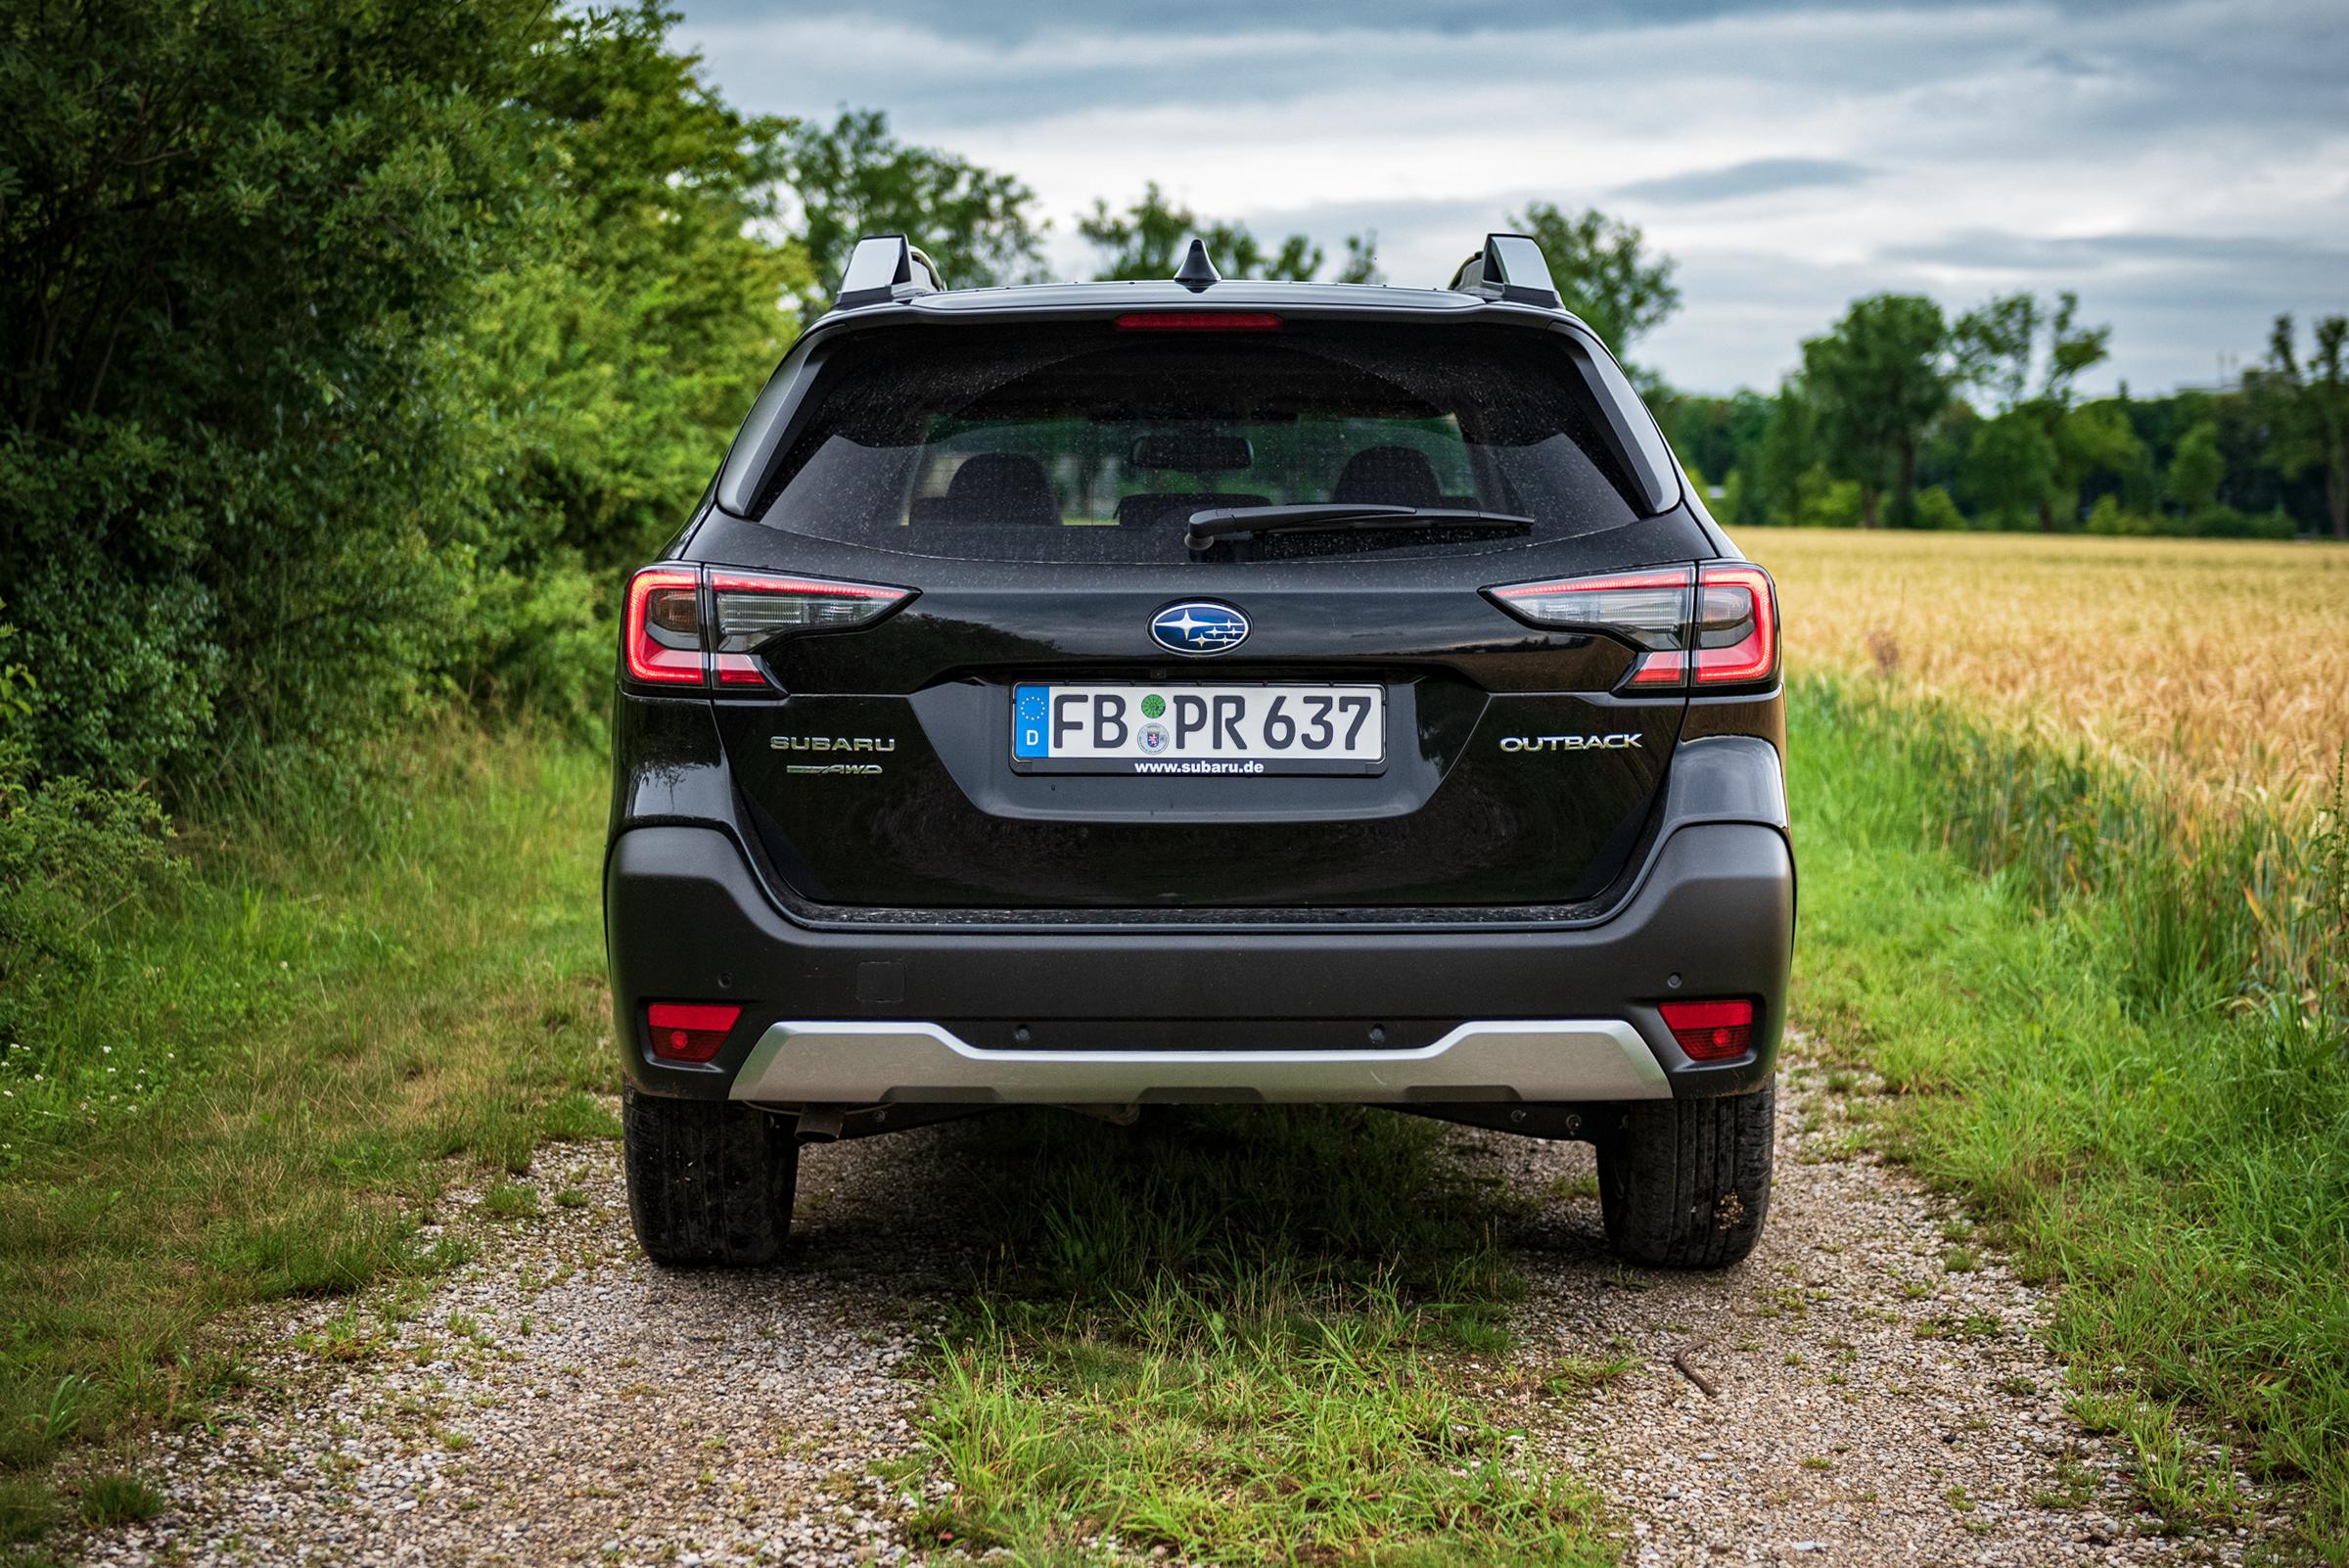 Subaru-Outback-2021-Rear